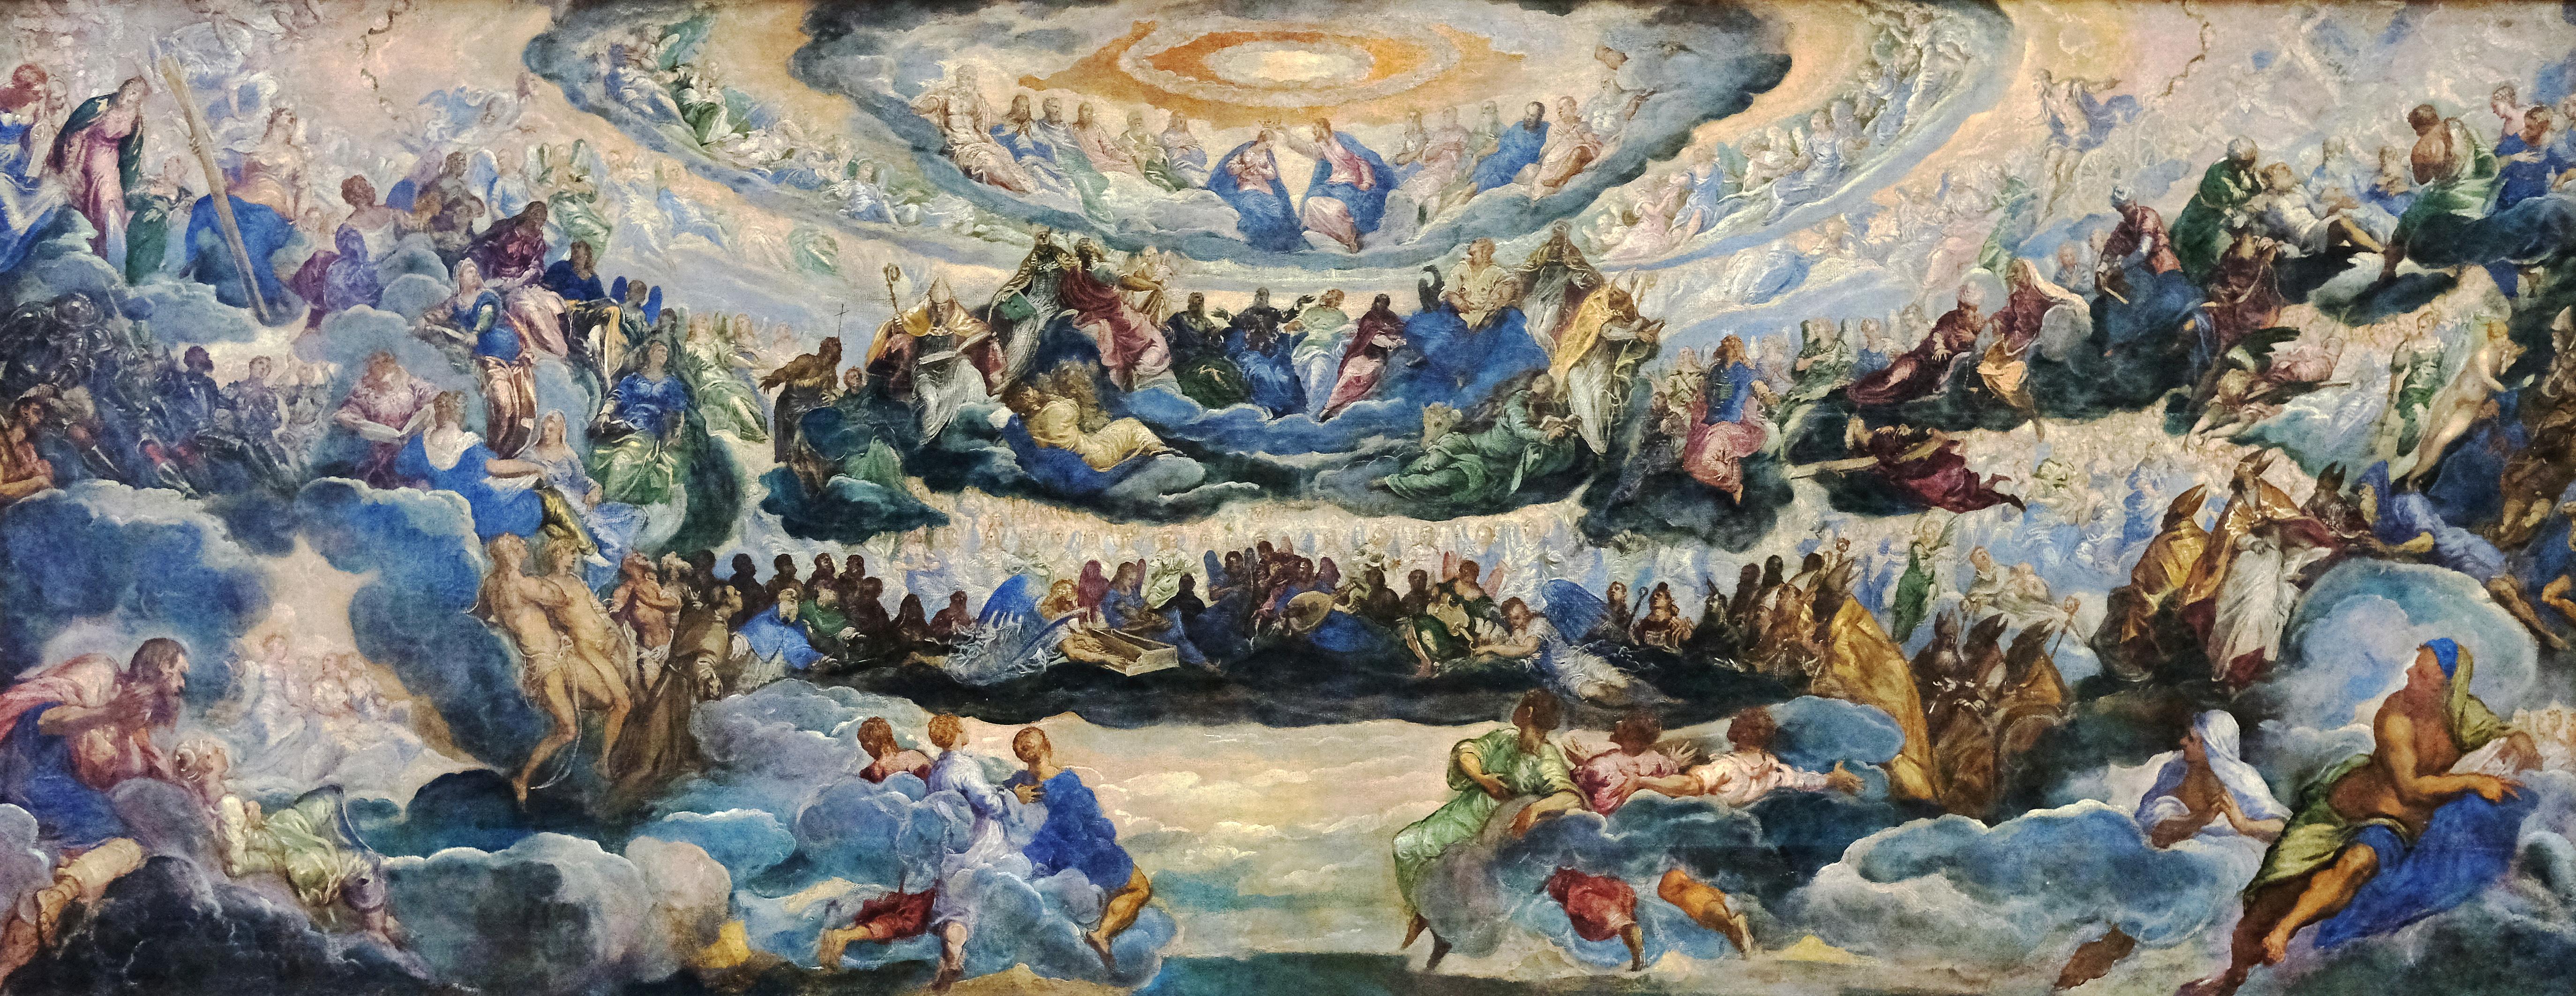 https://upload.wikimedia.org/wikipedia/commons/3/34/F0427_Louvre_Le_Tintoret_Le_Paradis_INV570_rwk.jpg